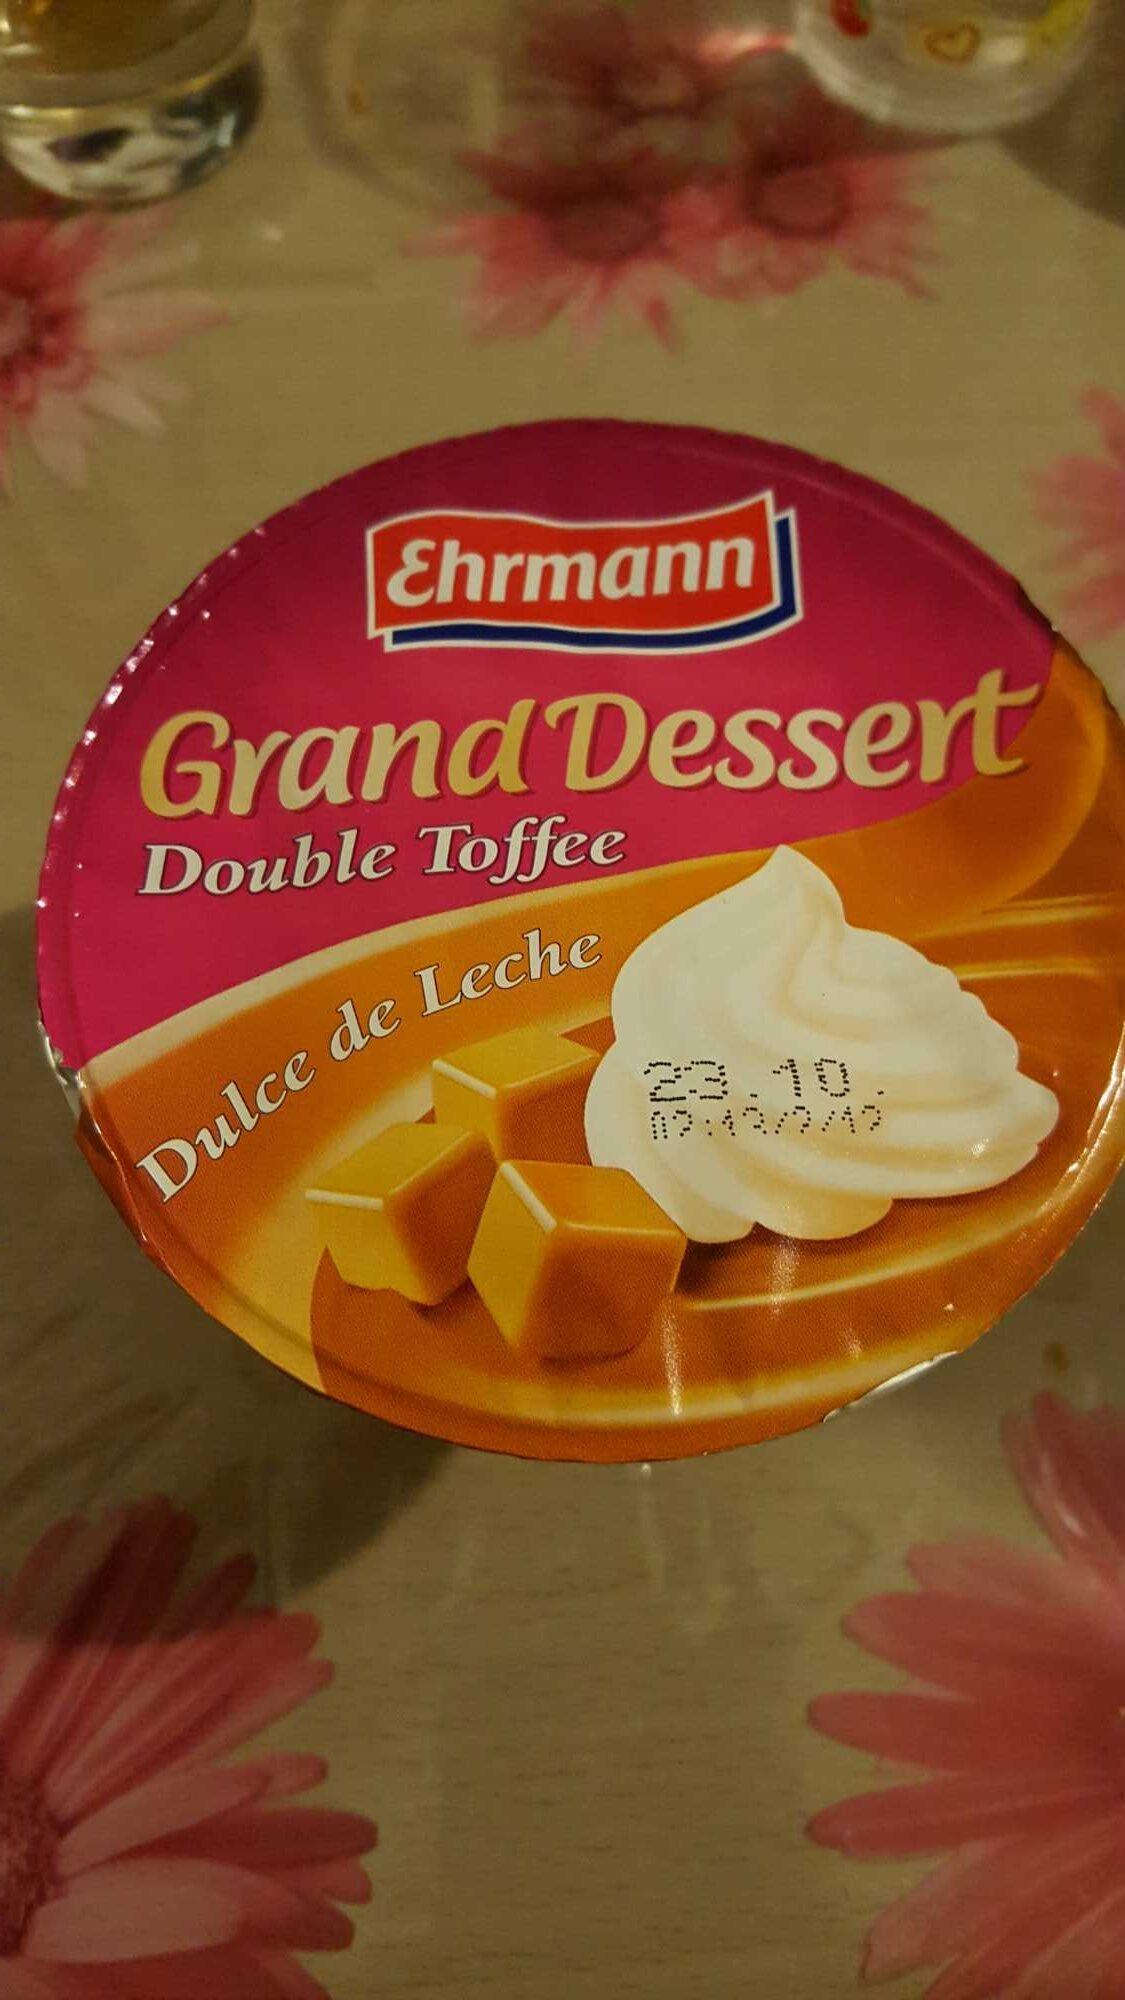 Grand Dessert Double Toffee Dulce de Leche - Product - fr